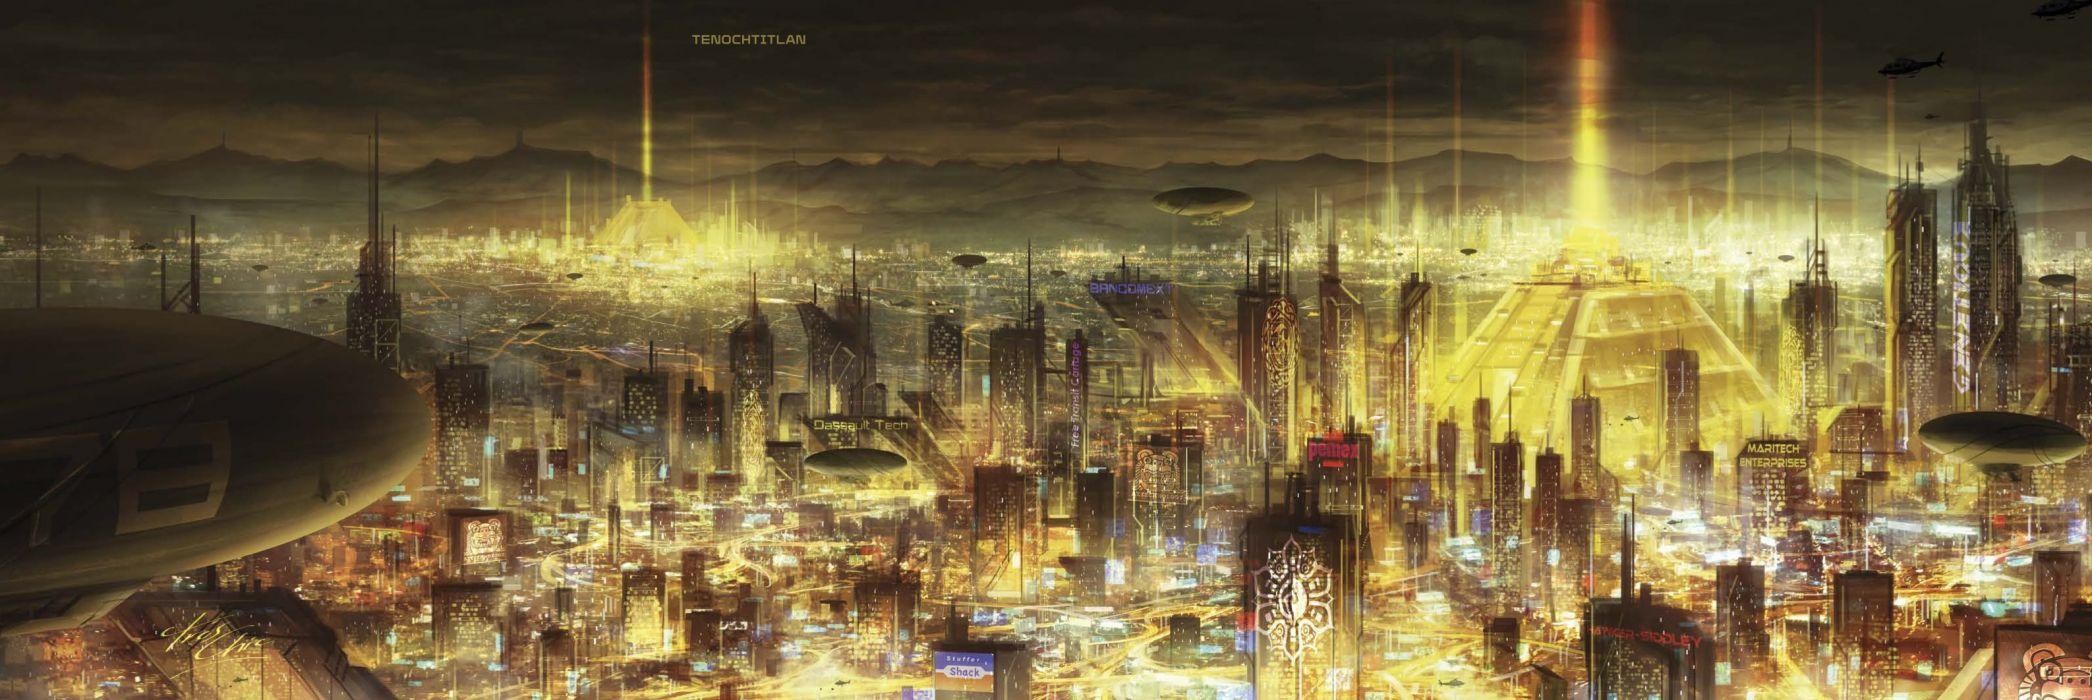 SHADOWRUN cardgame game mmo online fantasy sci-fi warrior fighting cyberpunk shooter (45) wallpaper